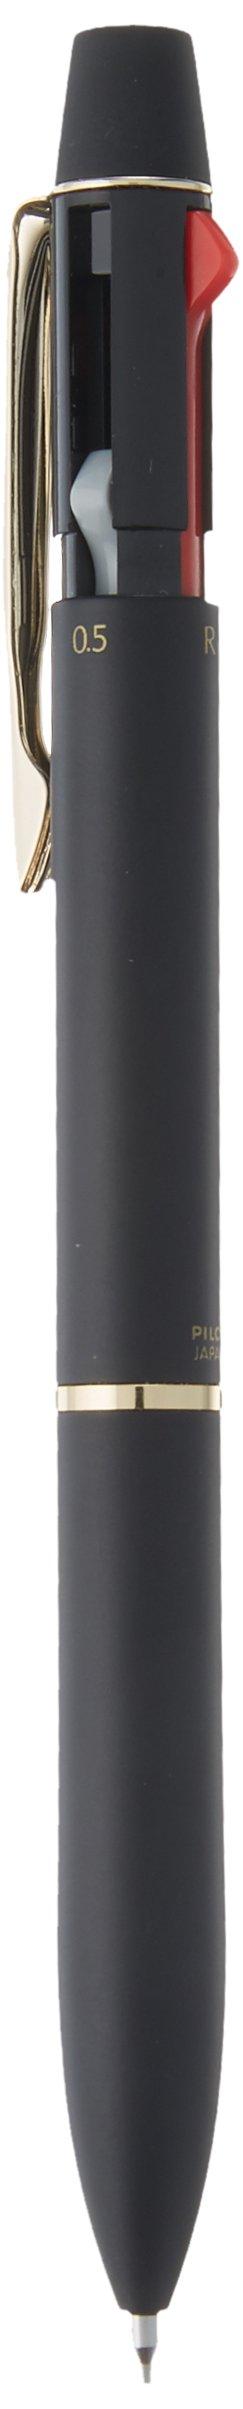 Pilot Mechanical Pencil + Ballpoint Pen, 0.7mm, Fine, Black and Red, 2+1 Acro Drive, Black (BKHD-250R-B)